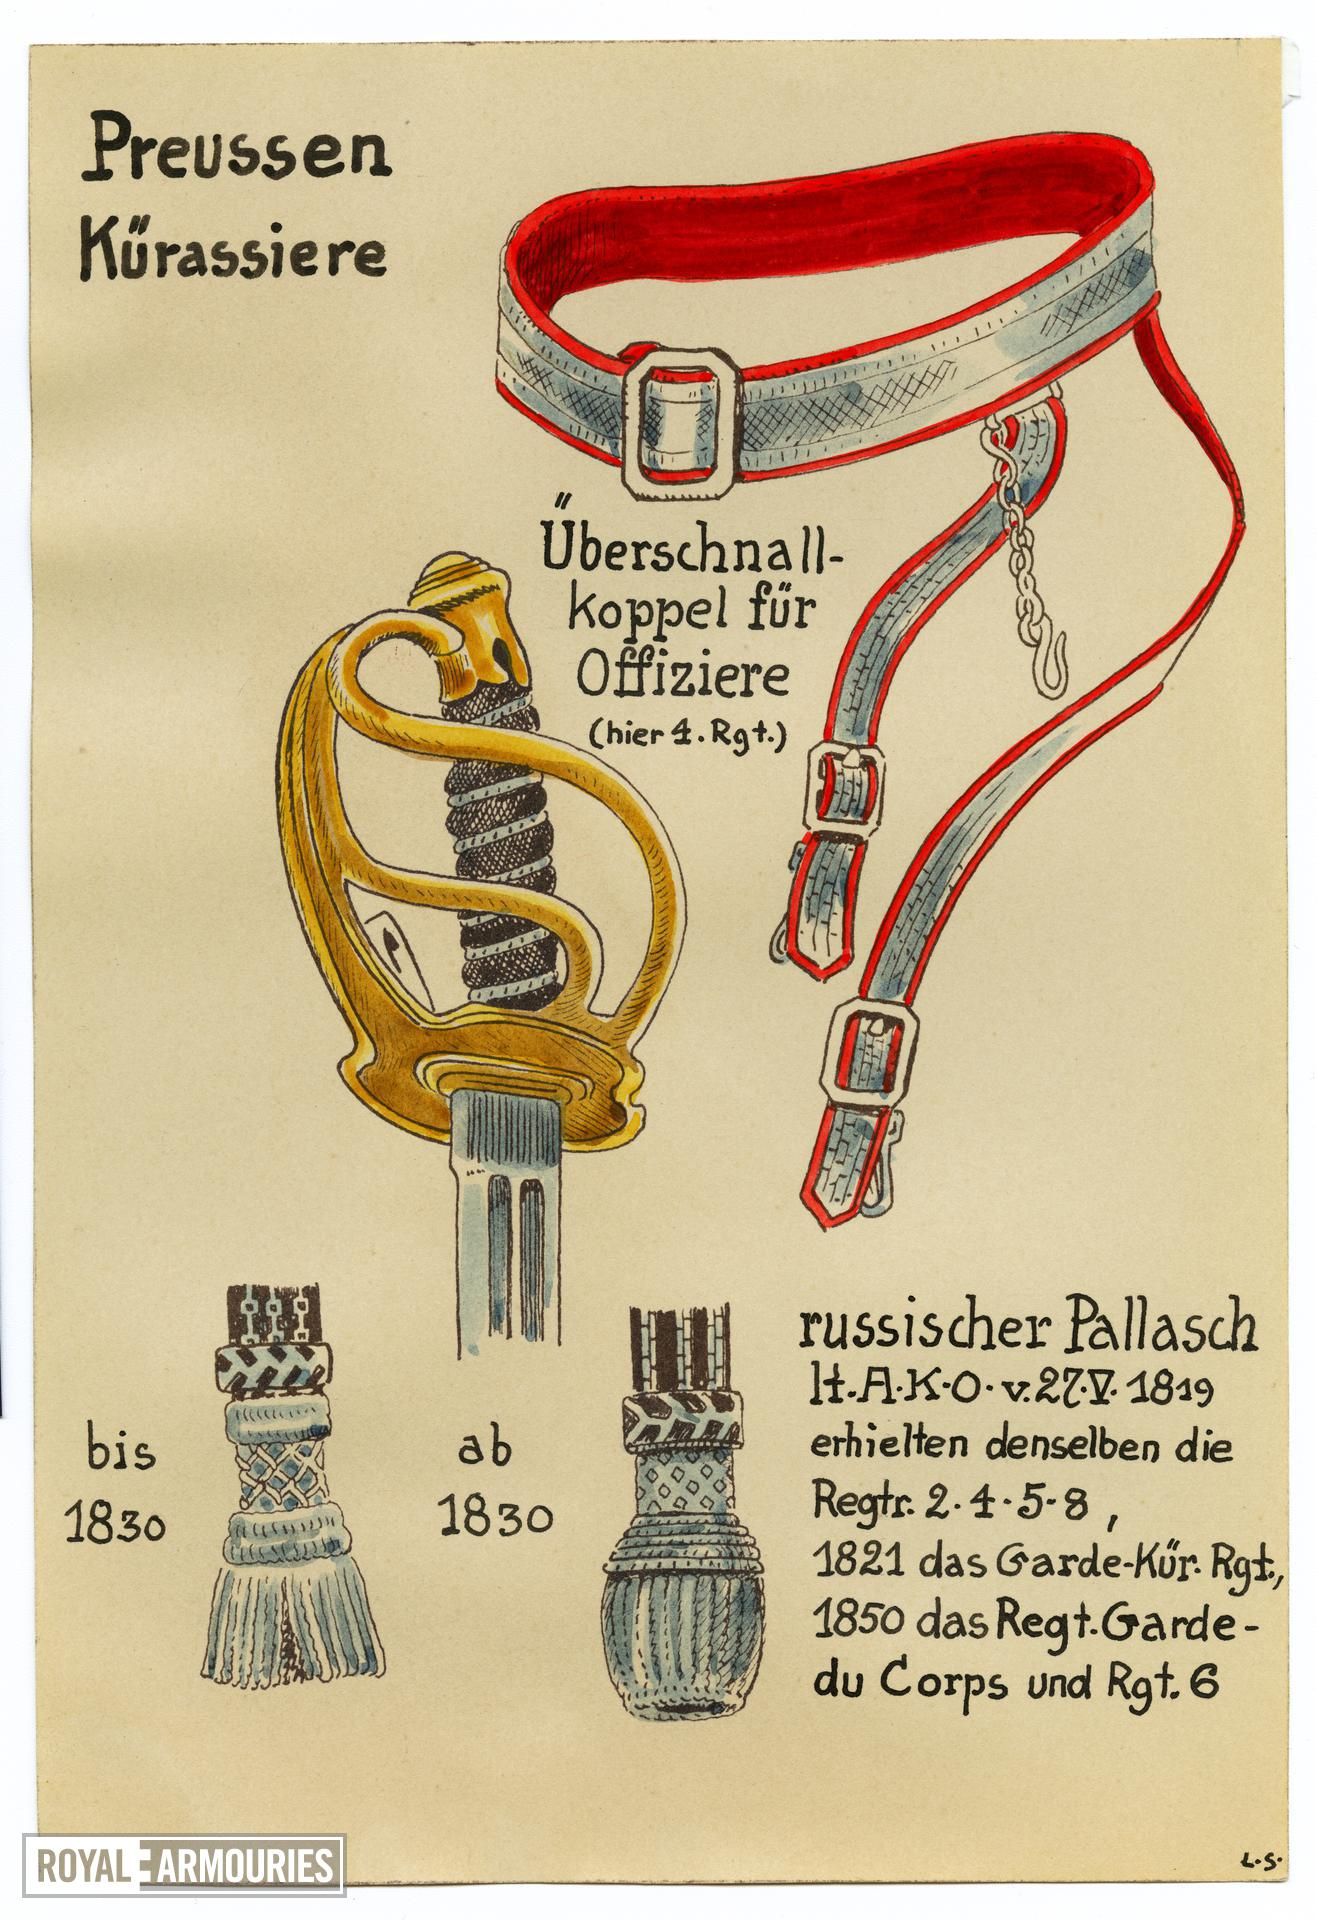 5/7 coloured drawings of German military swords.